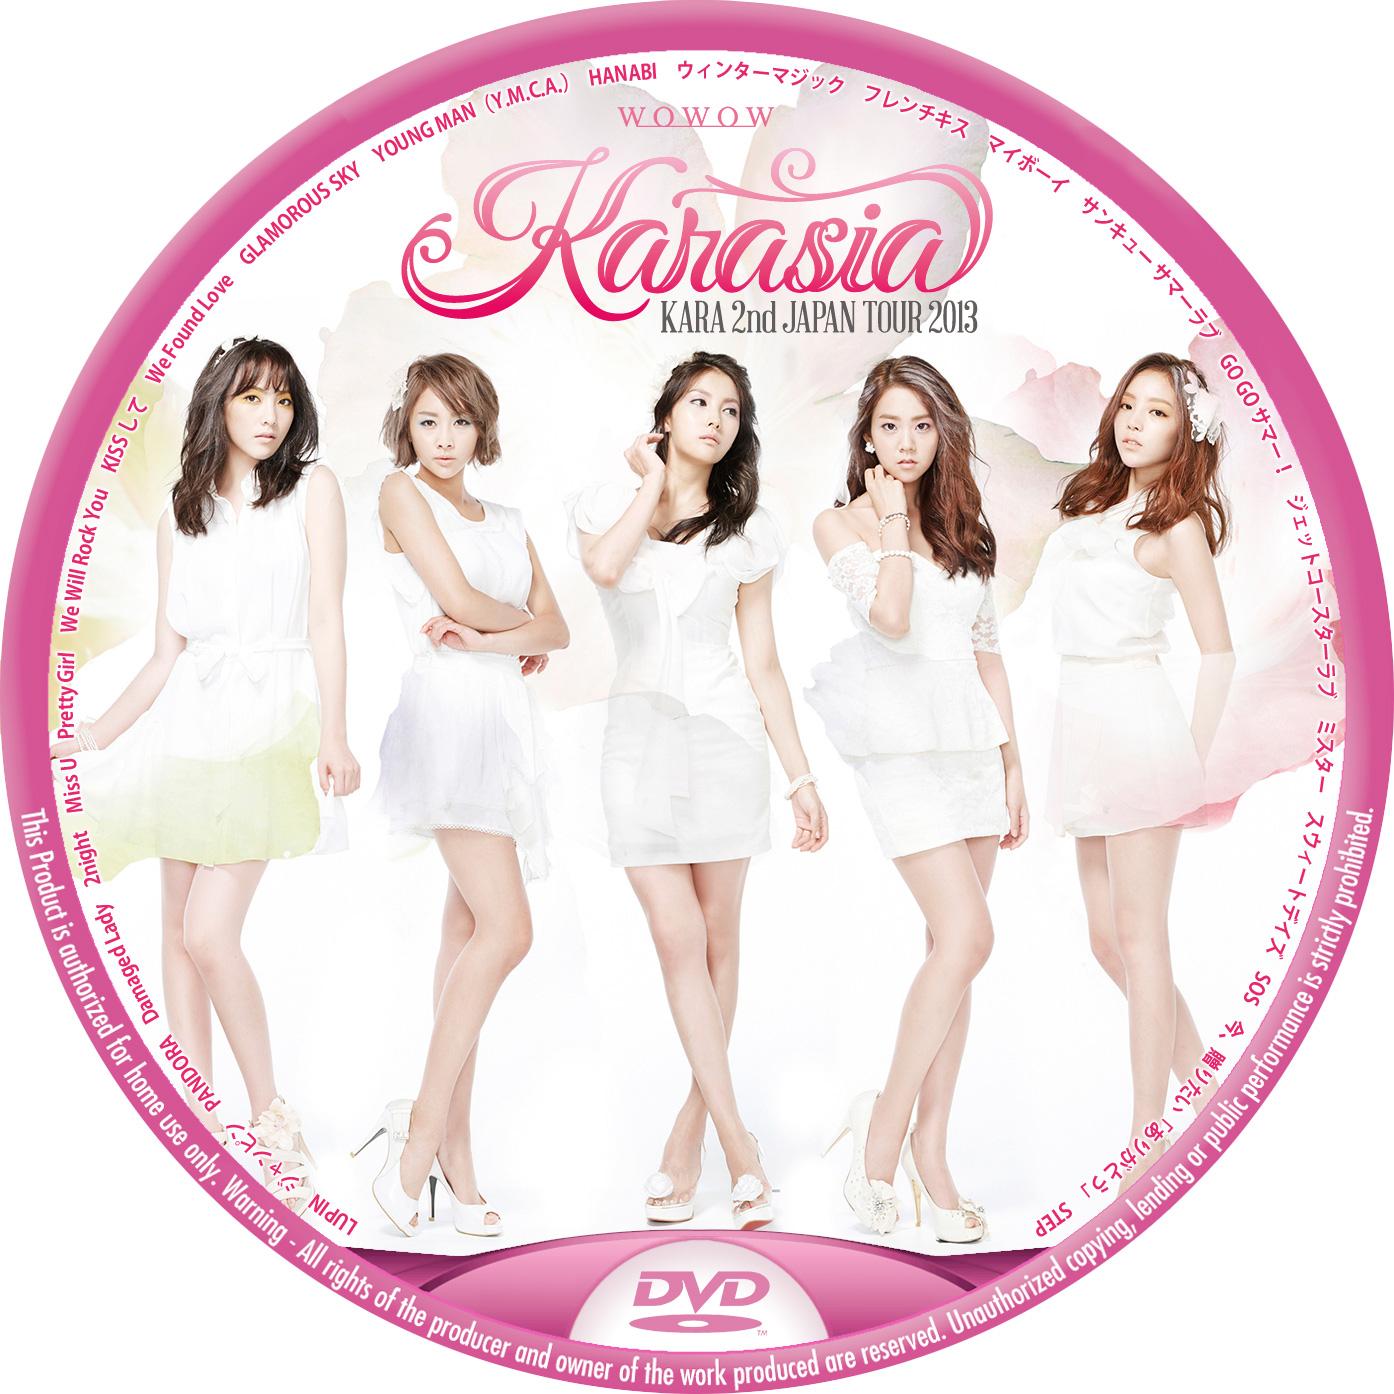 KARA WOWOW DVDラベル